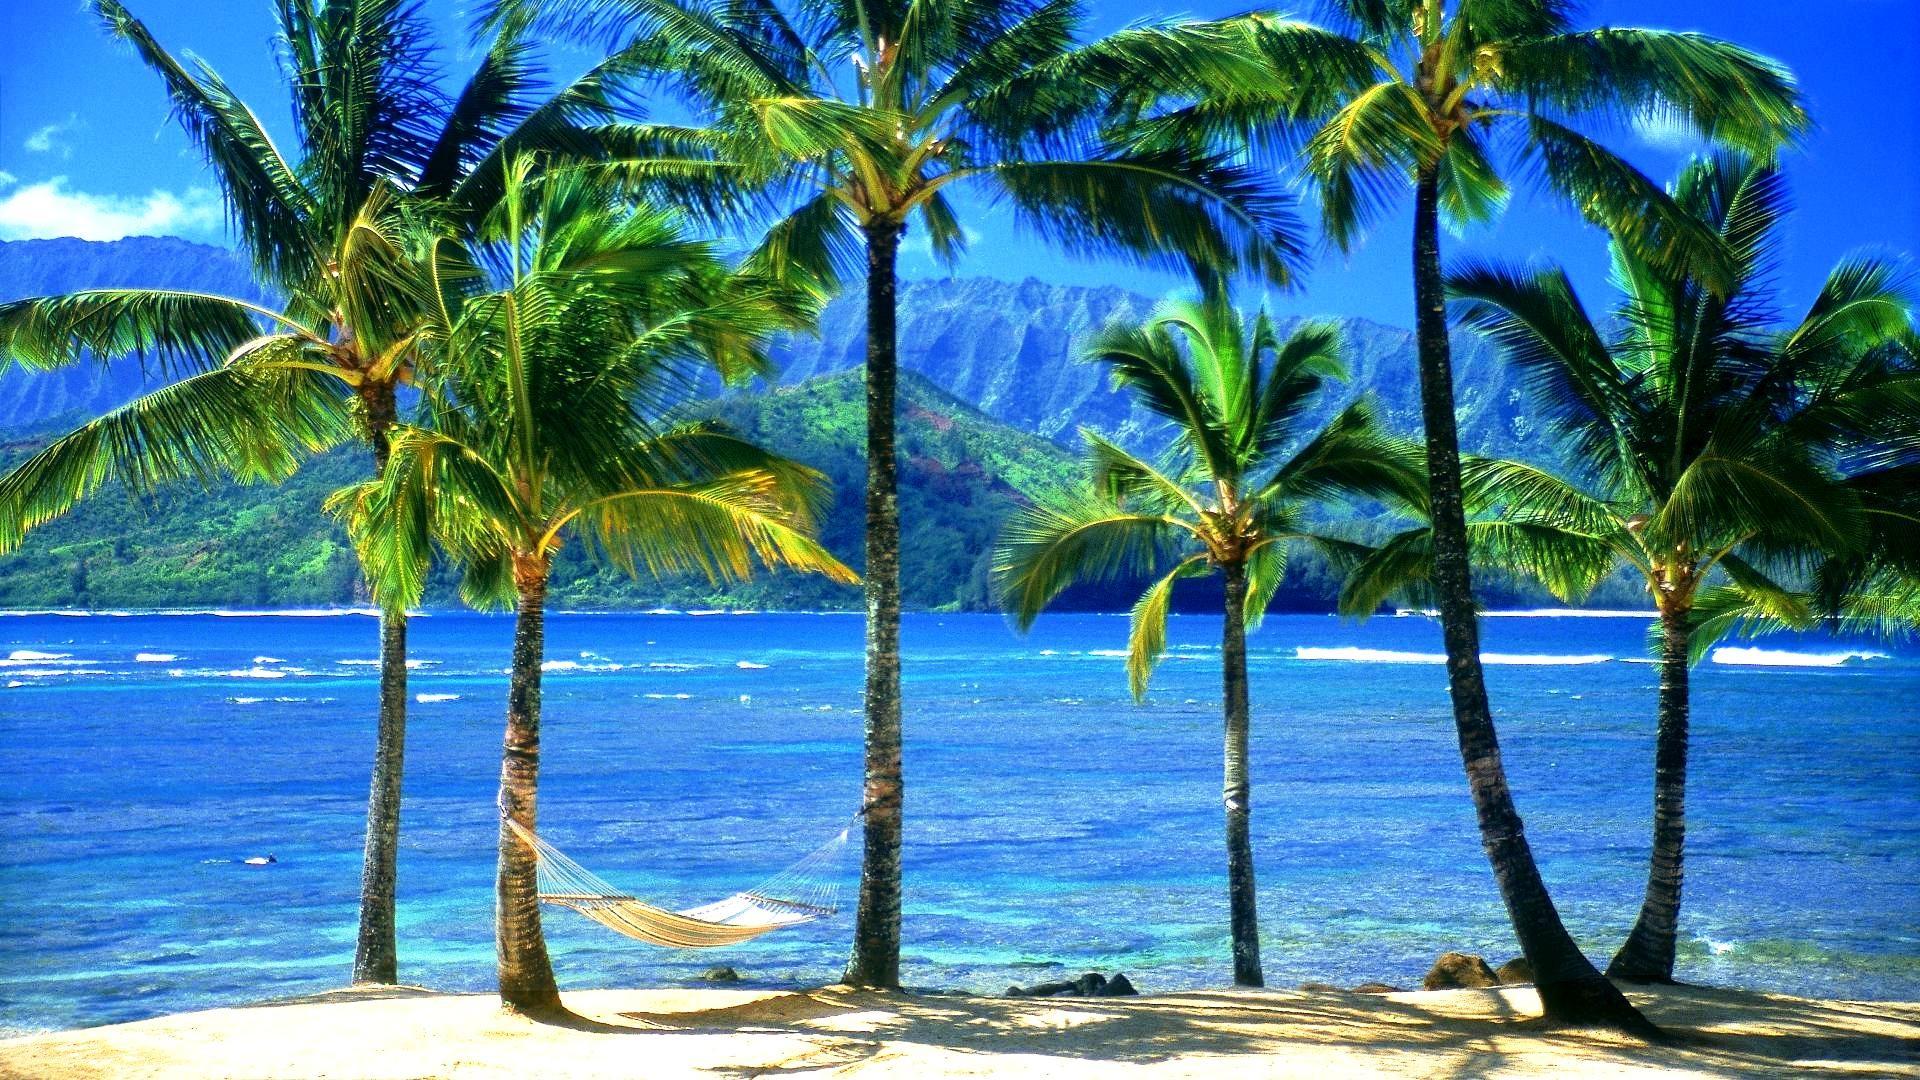 Res: 1920x1080, Waikiki Beach Wallpaper HD | Most Beautiful Waikiki Beach HD .